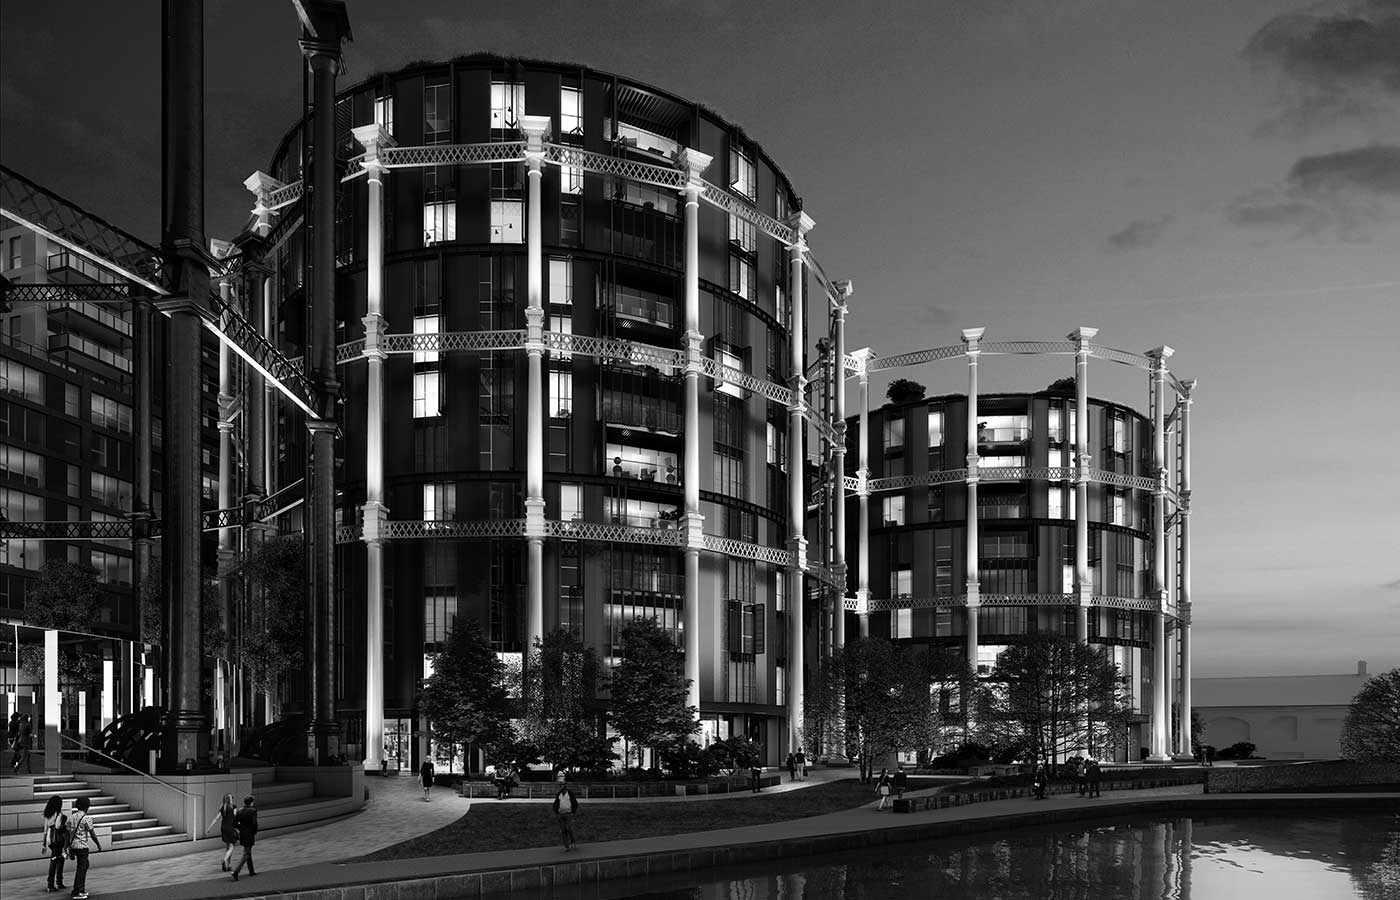 A rendering of the Gasholders London residential development